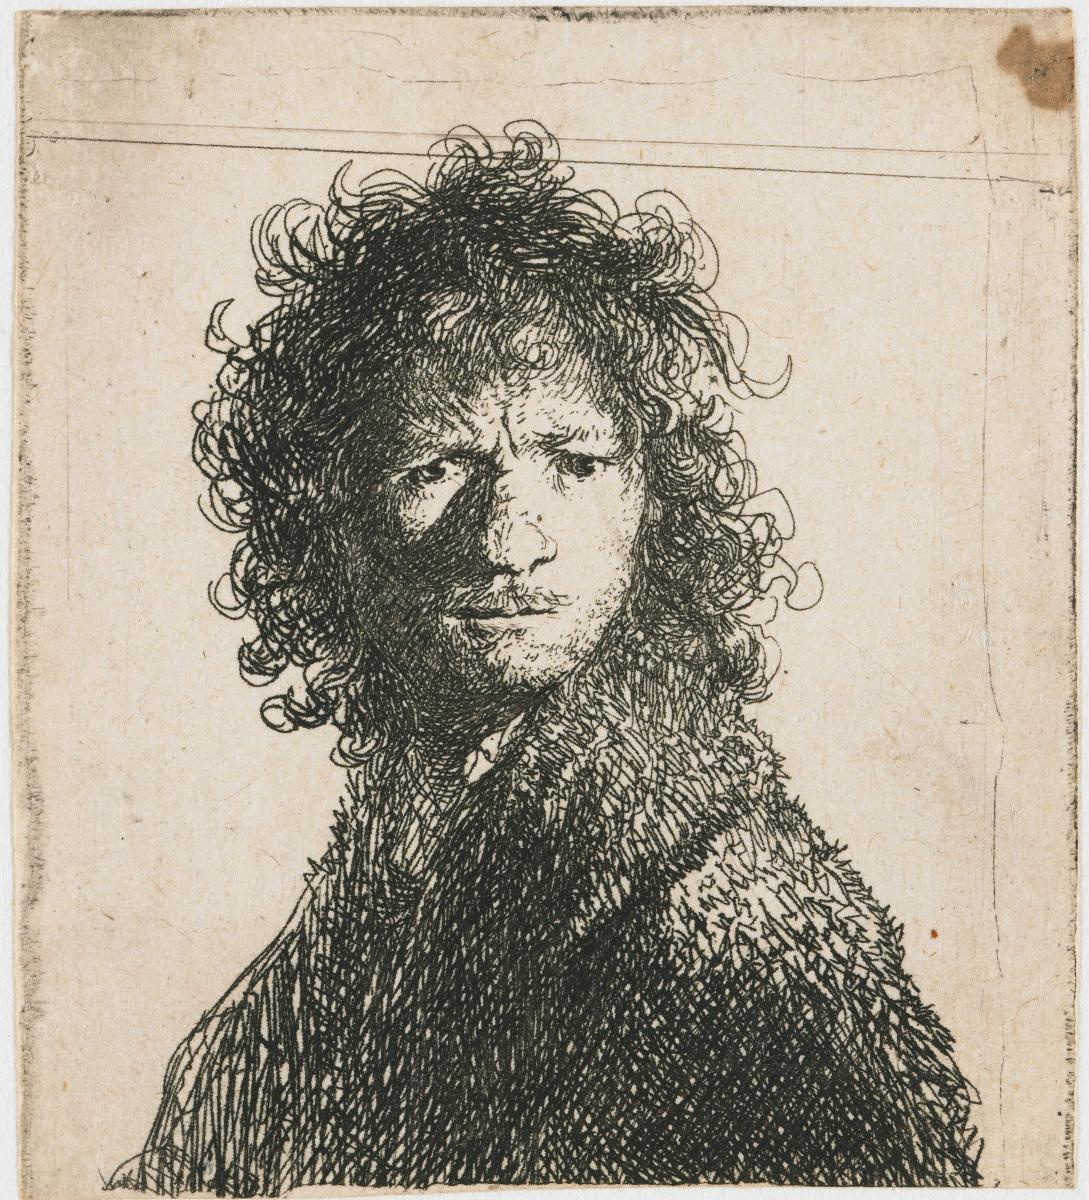 Rembrandt Harmenszoon van Rijn. Self portrait frowning